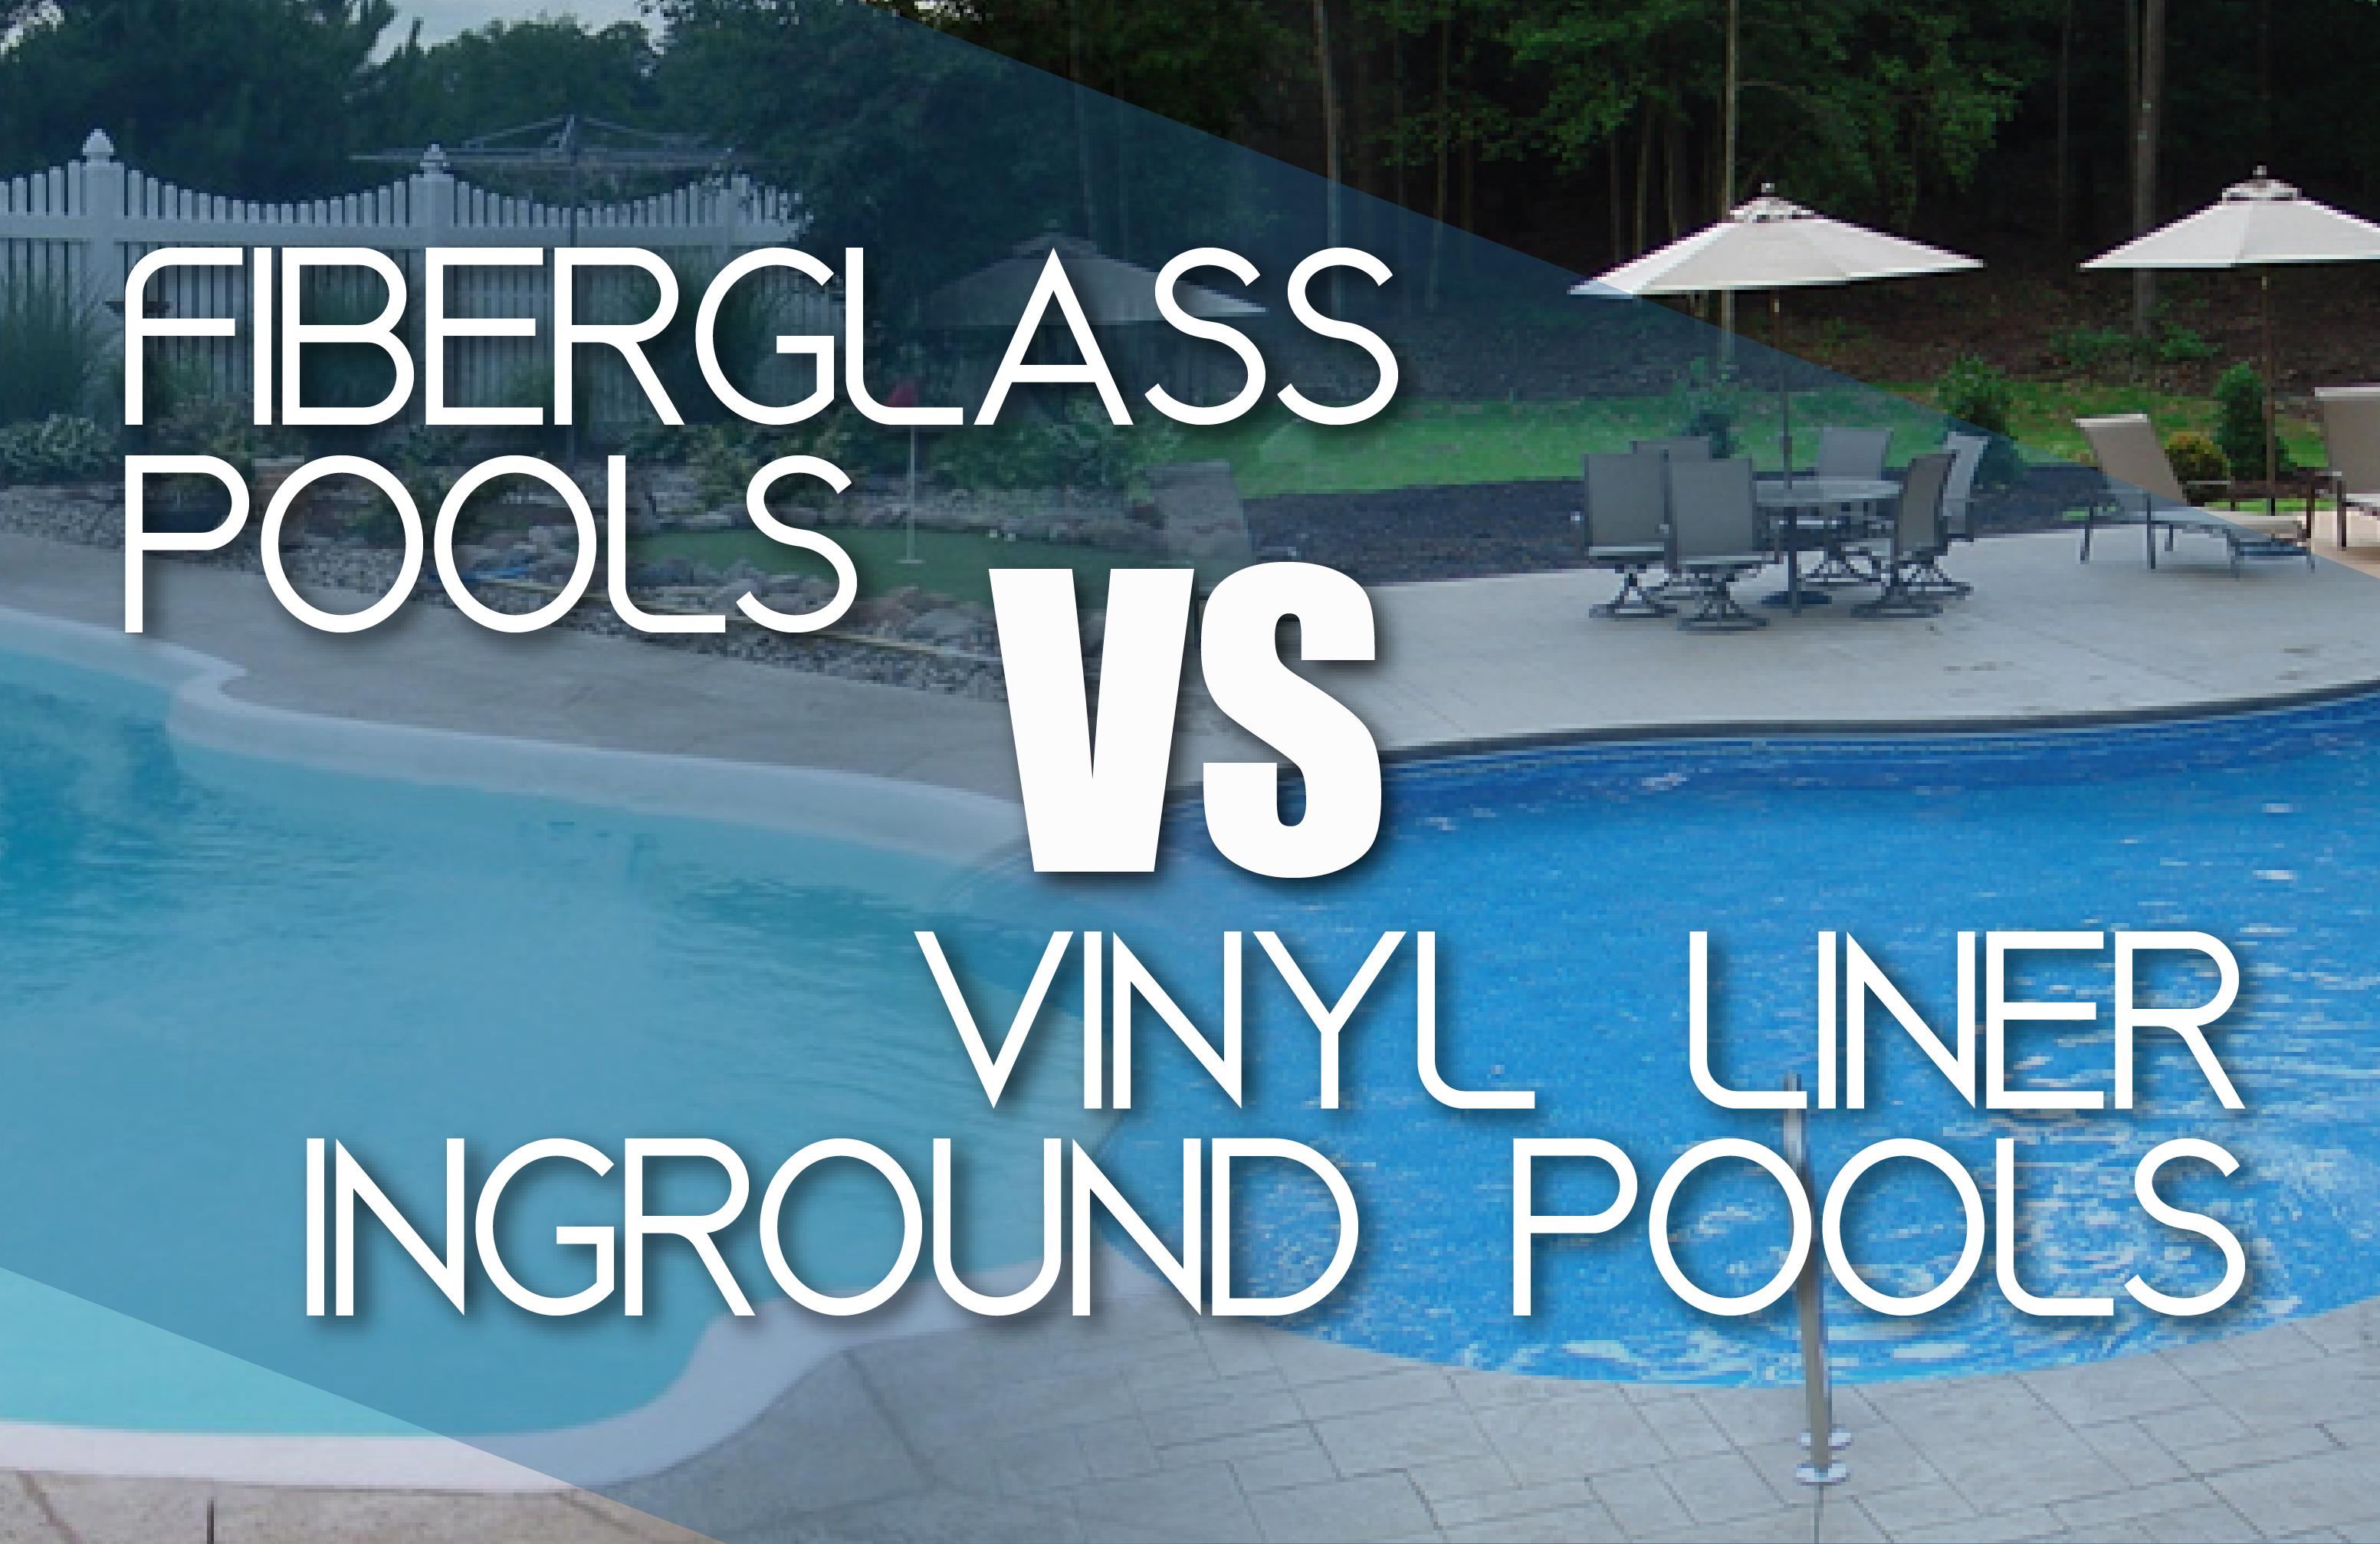 Fiberglass Pools Vs Vinyl Liner Inground Pool Kits Pool